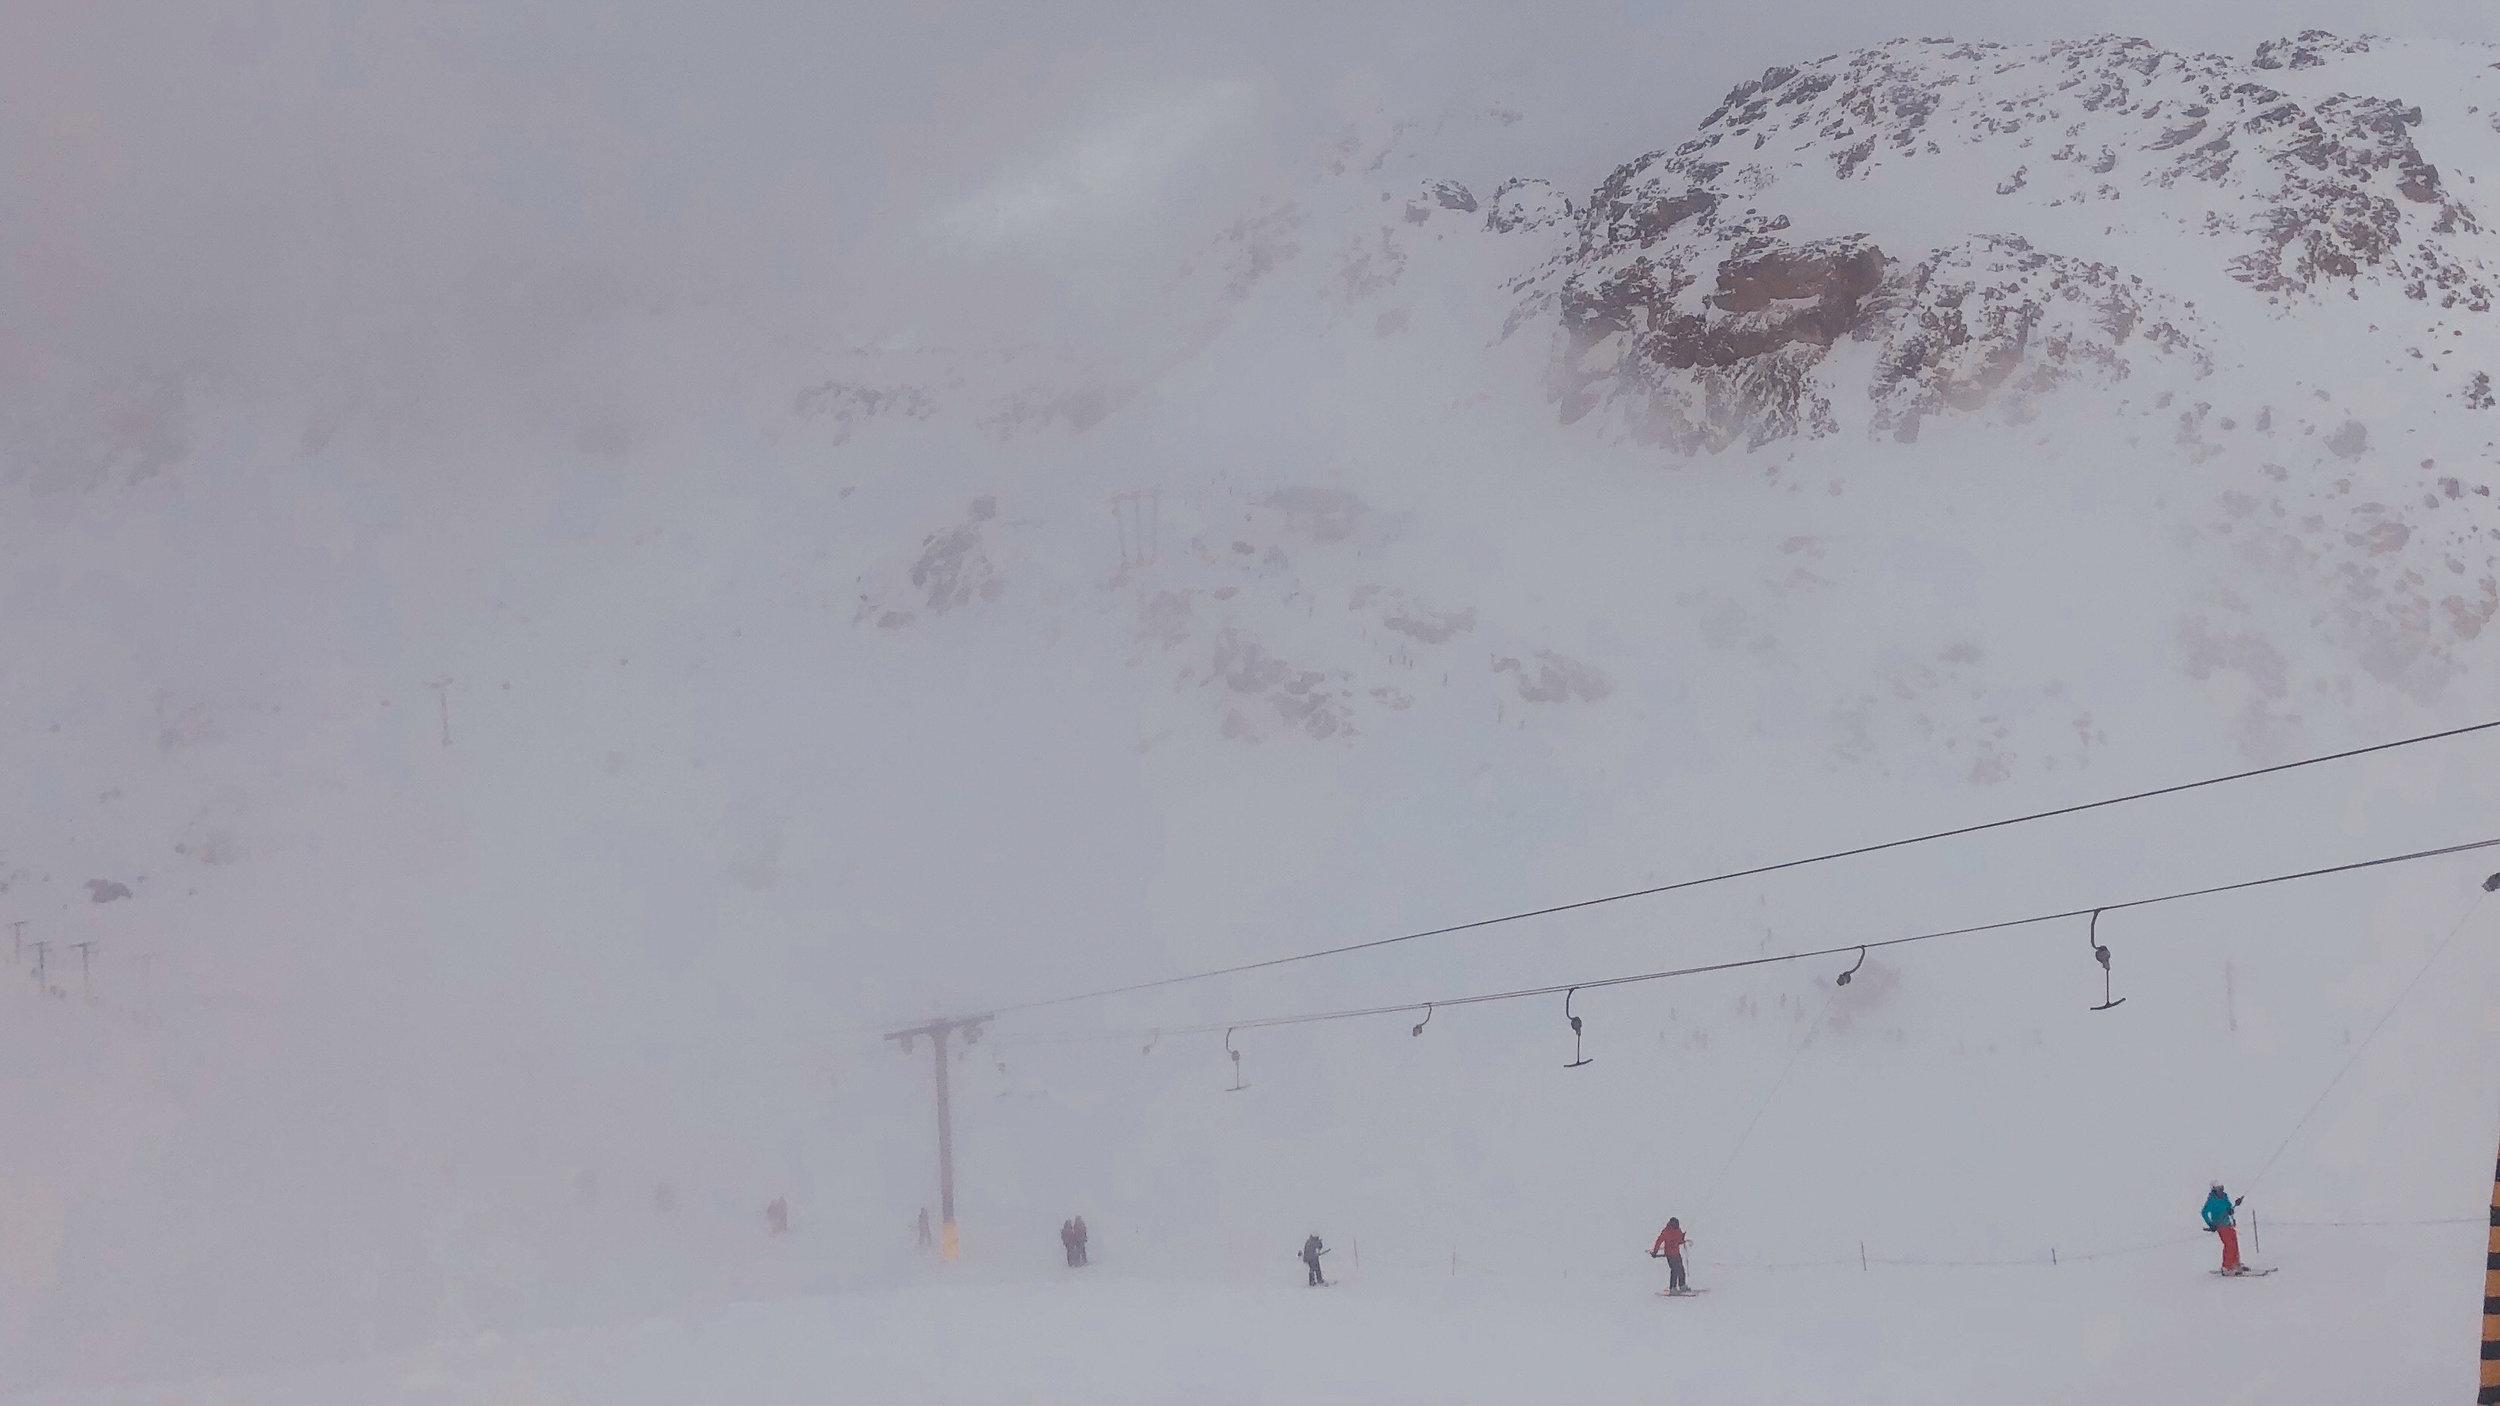 whistler 2018 - blackcomb glacier